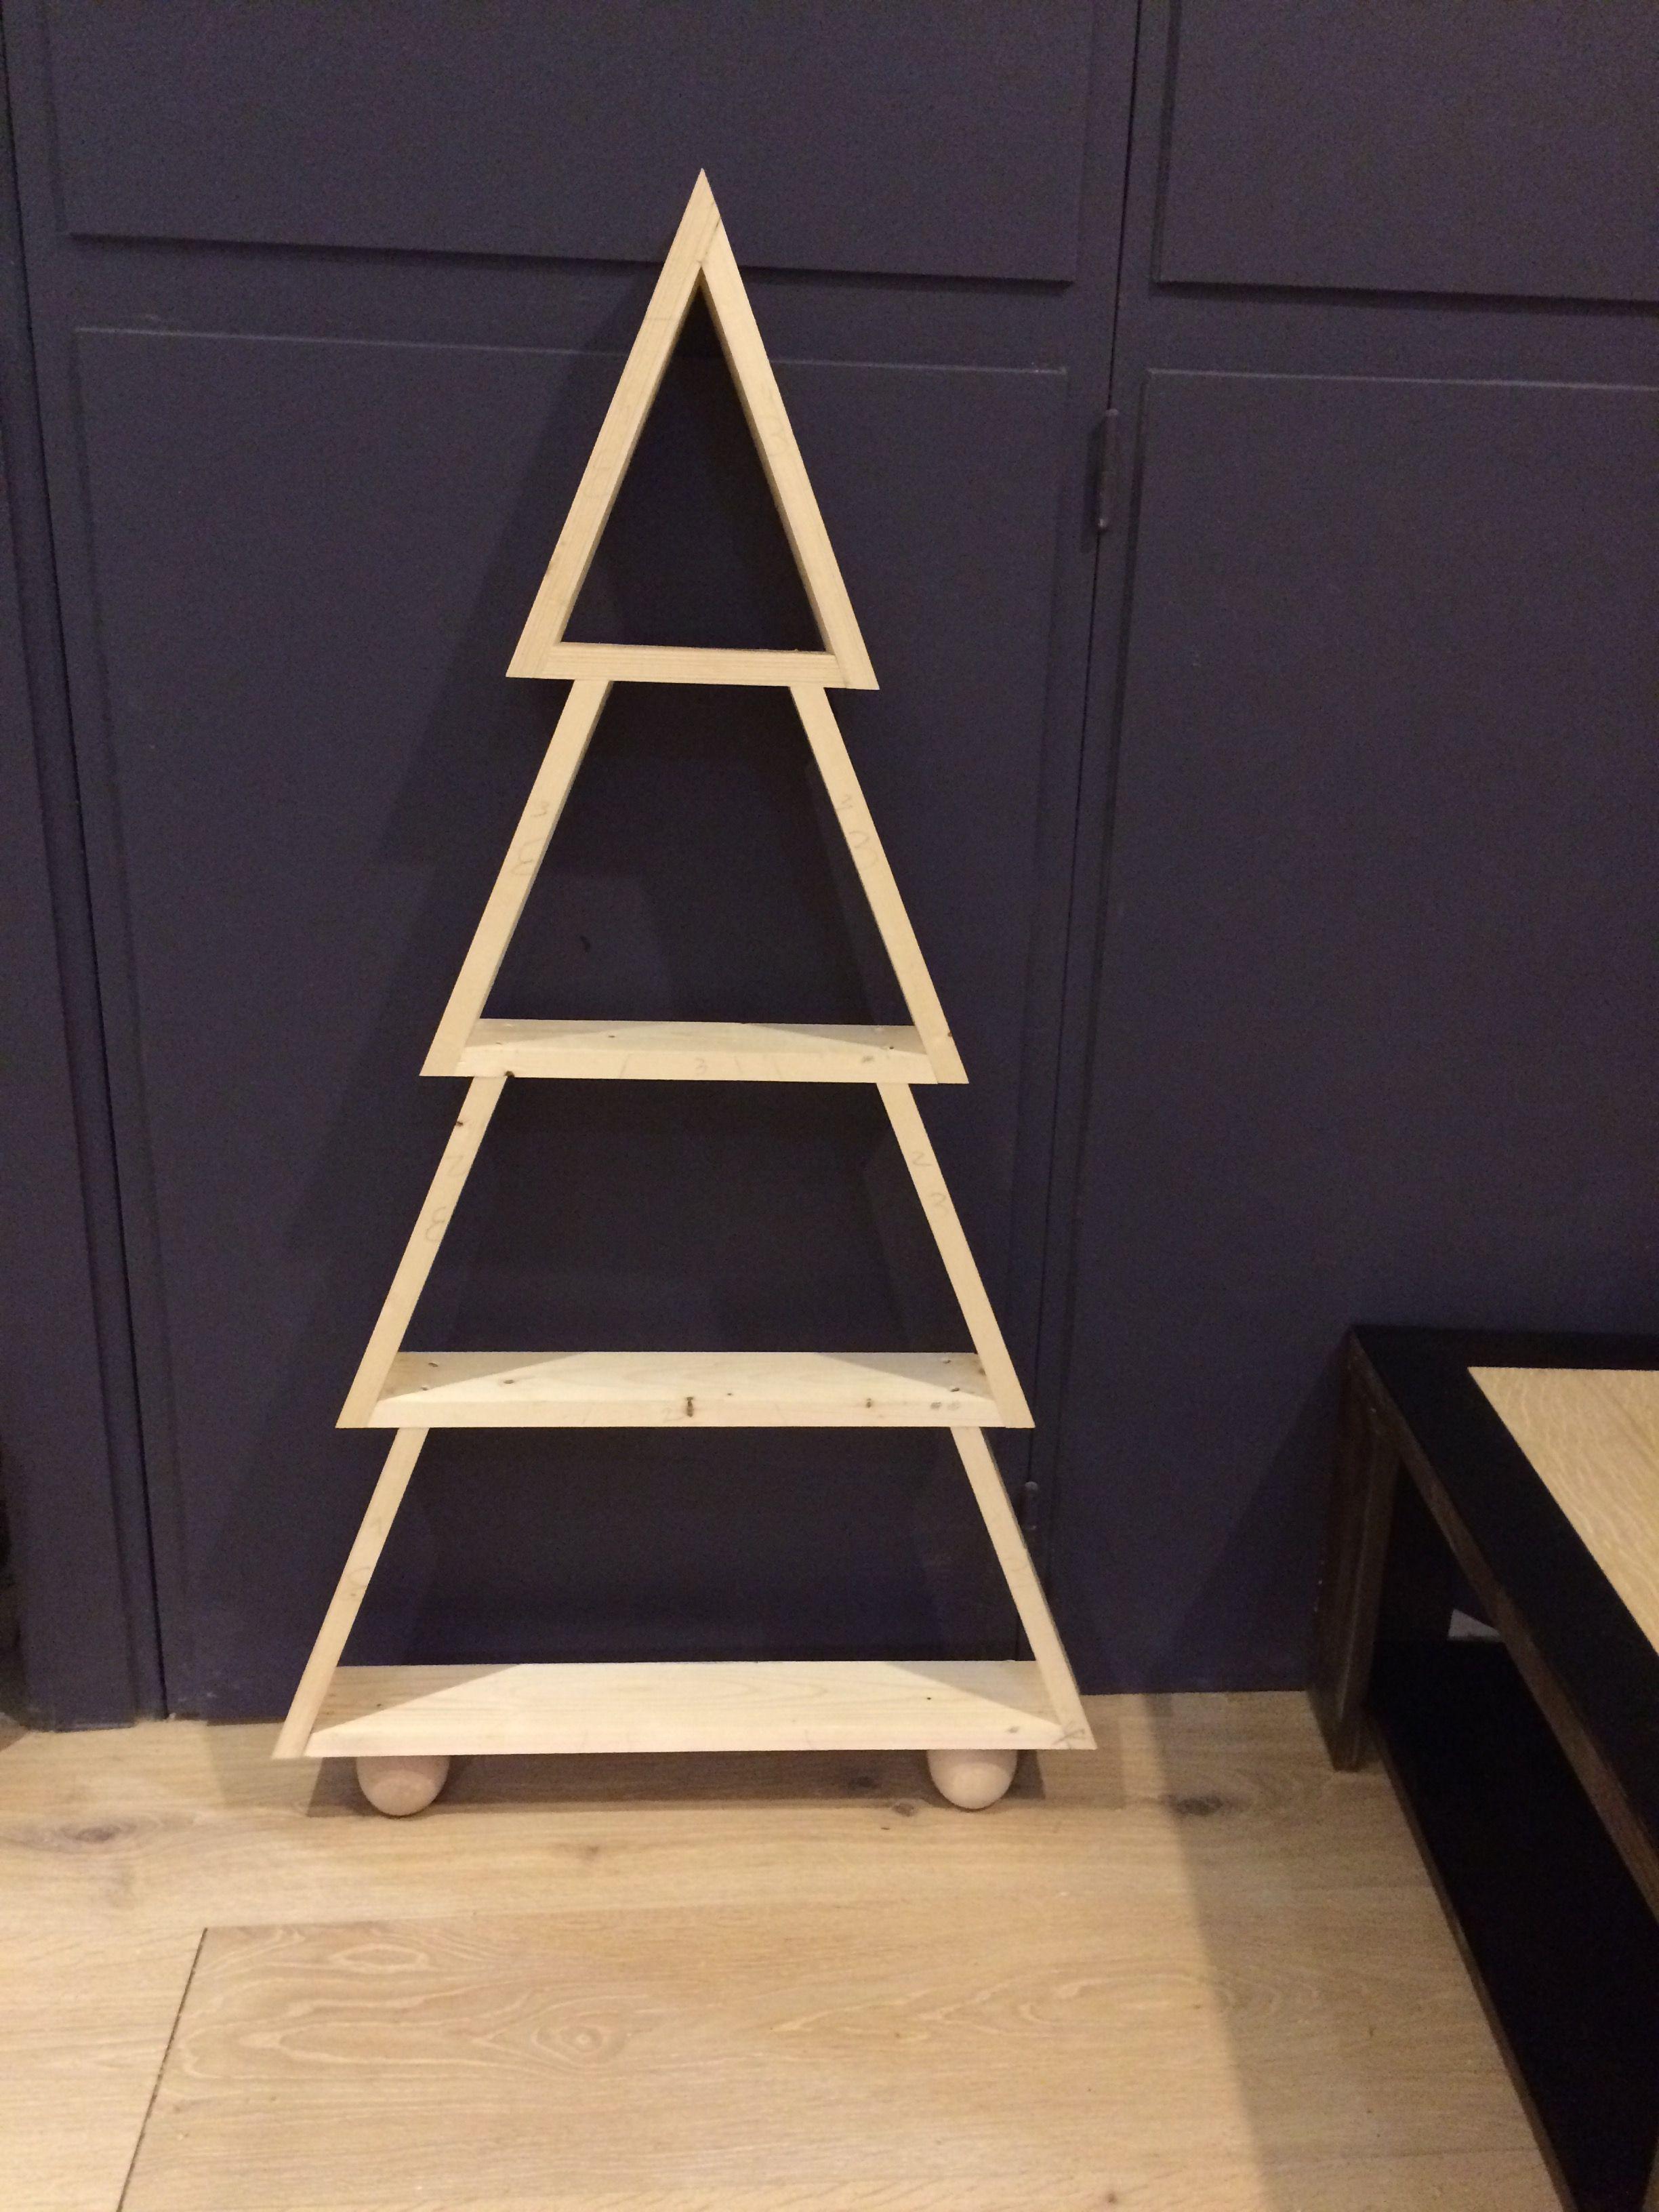 Edition 2016 Sapin Noel En Bois Diy Cours De Menuiserie Angers Www Woodfabrique Com Idee Deco Noel Sapin Noel Bois Diy Noel Sapin